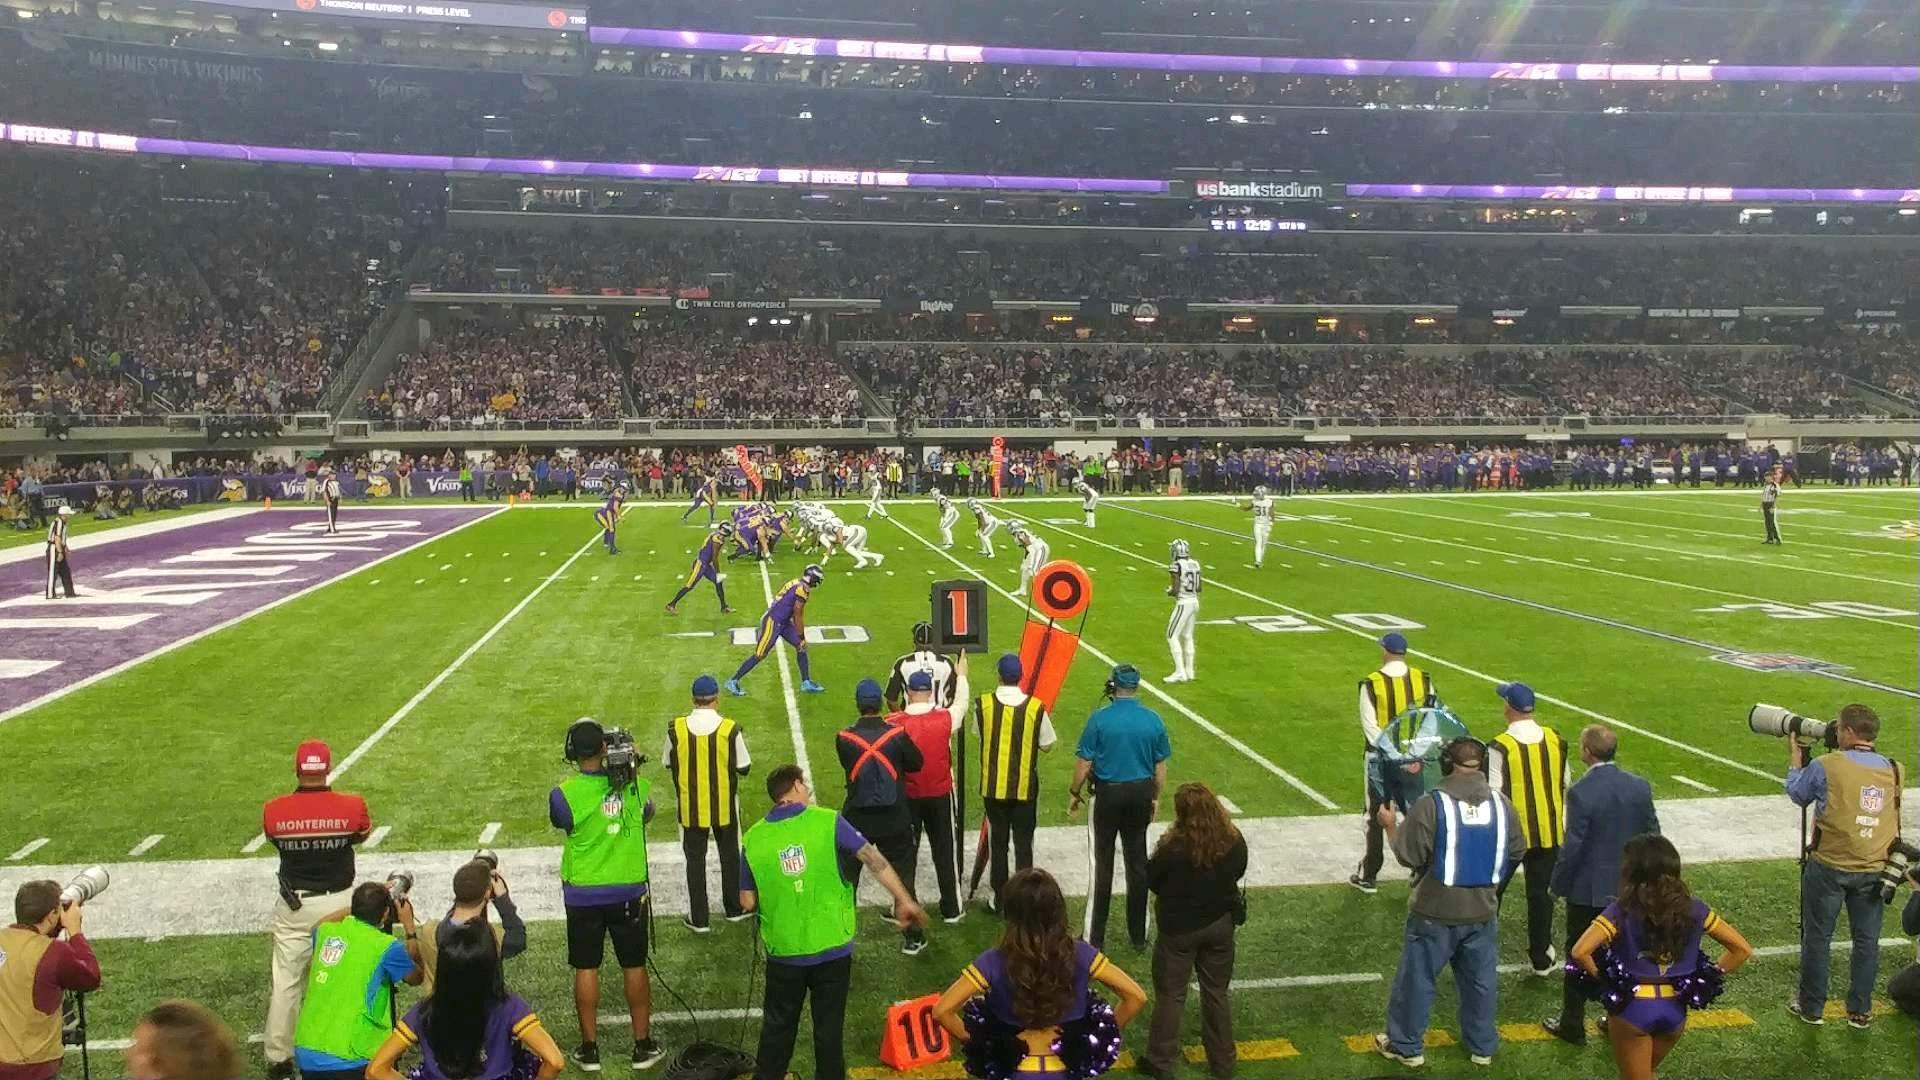 U.S. Bank Stadium Section 112 Row 2 Seat 13